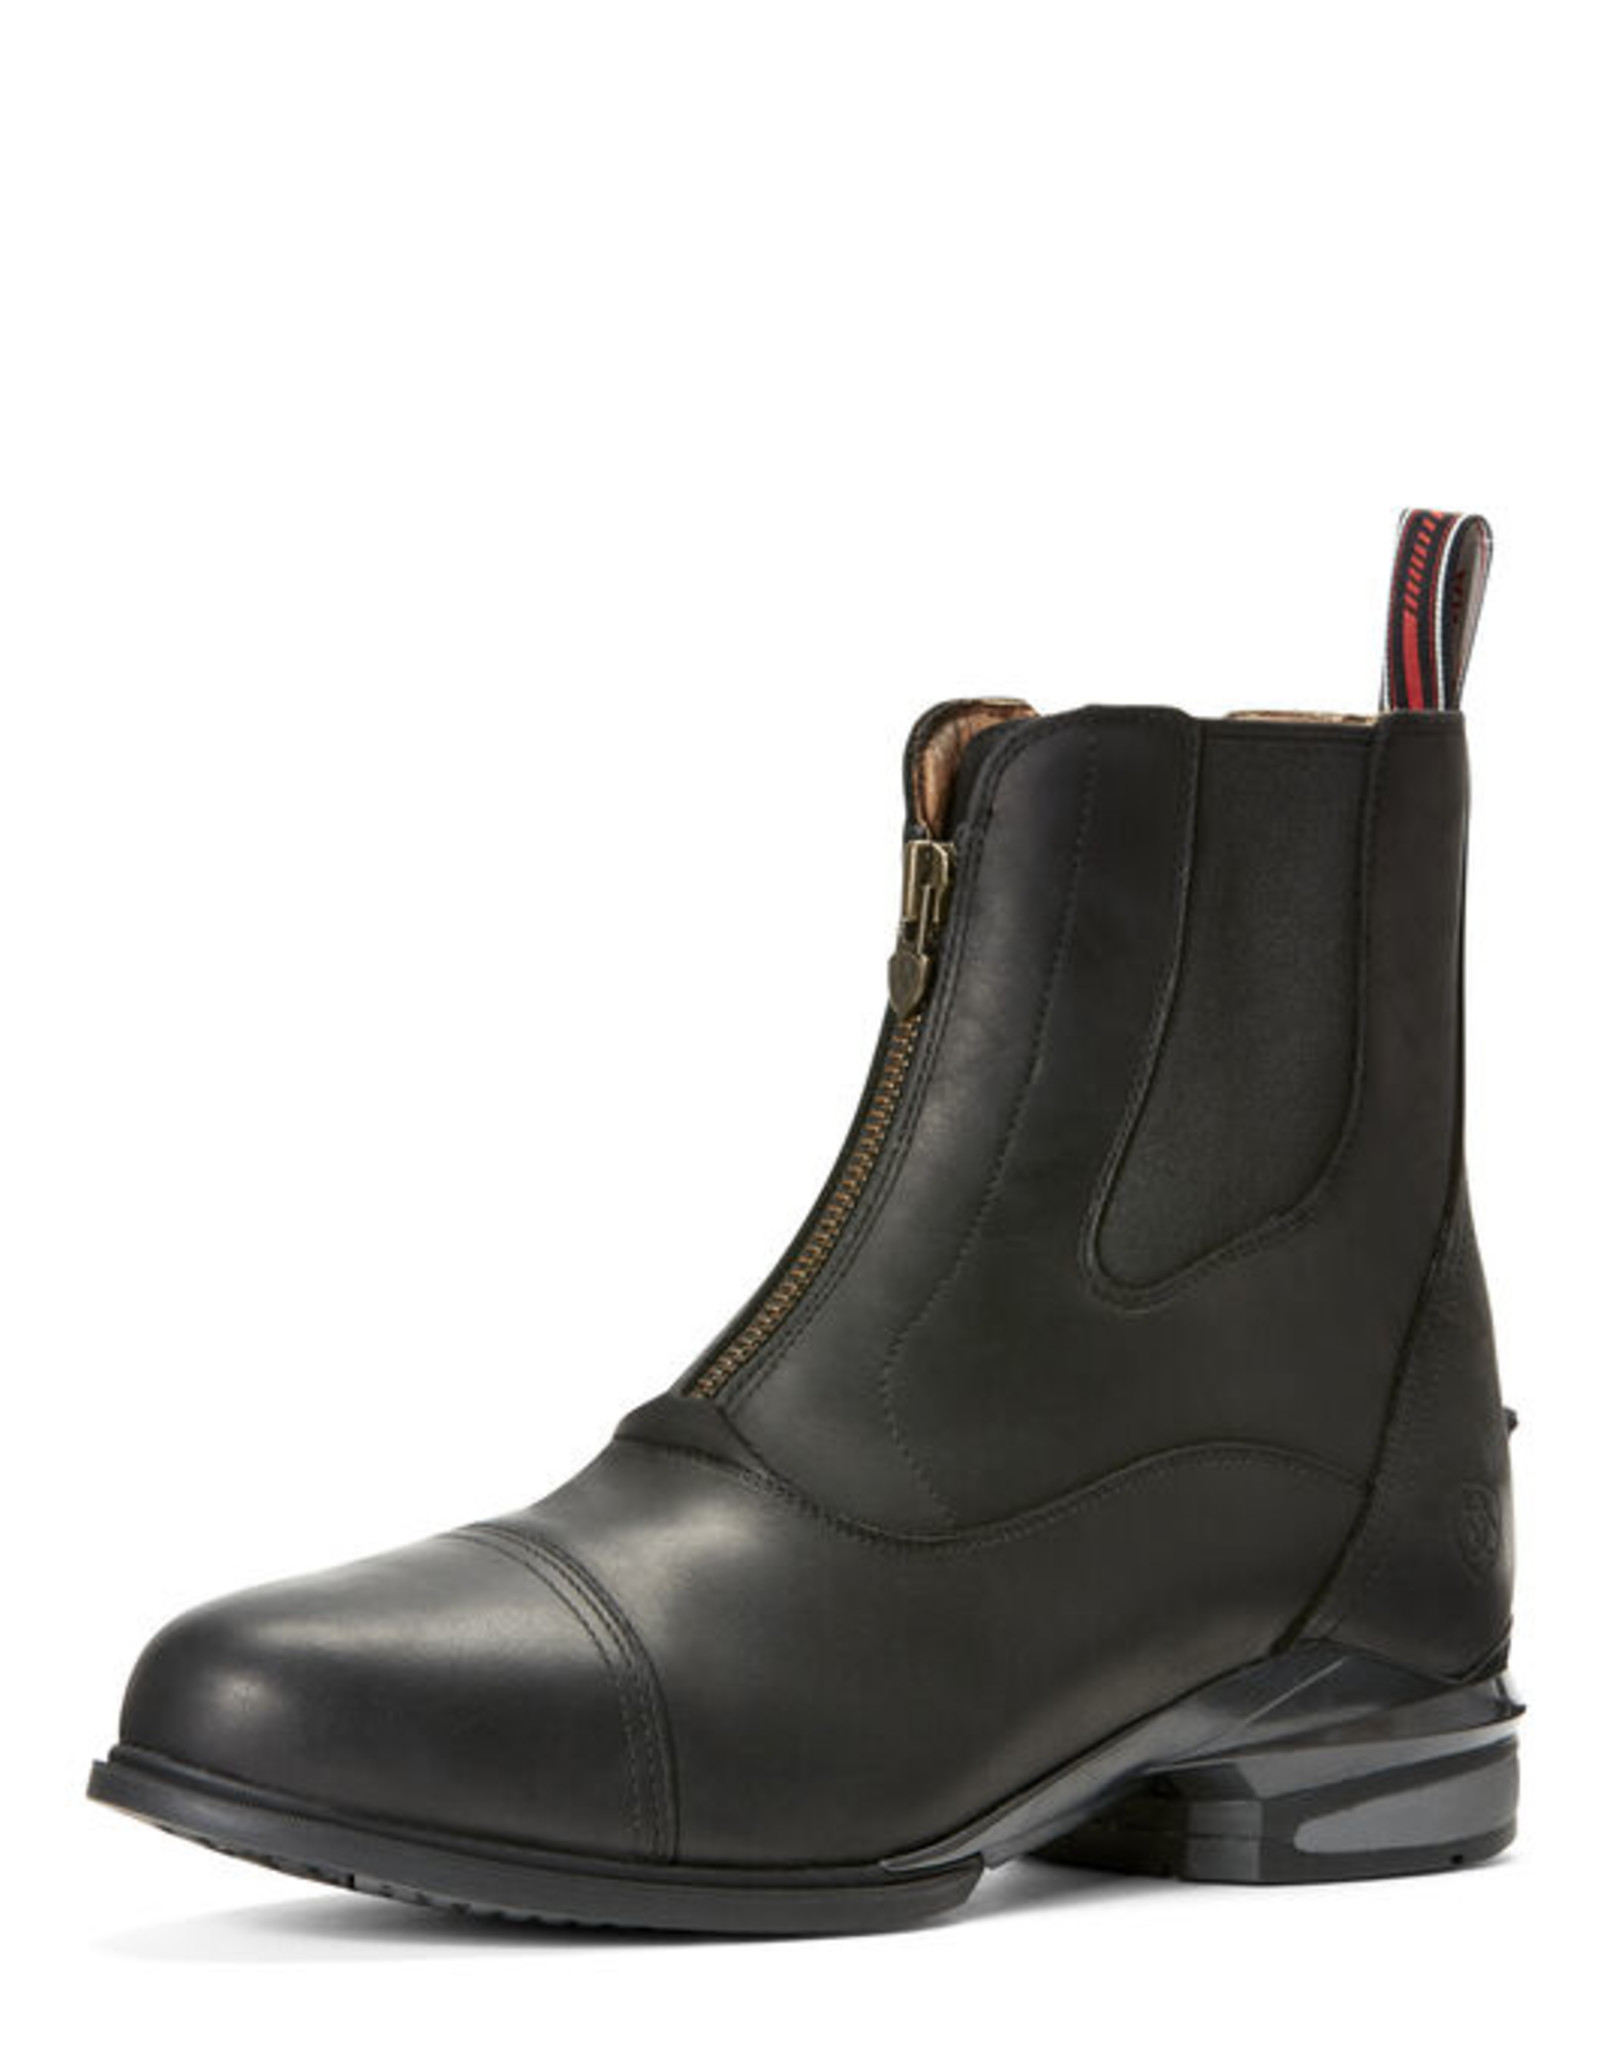 Ariat Men's Devon Nitro Paddock Boot